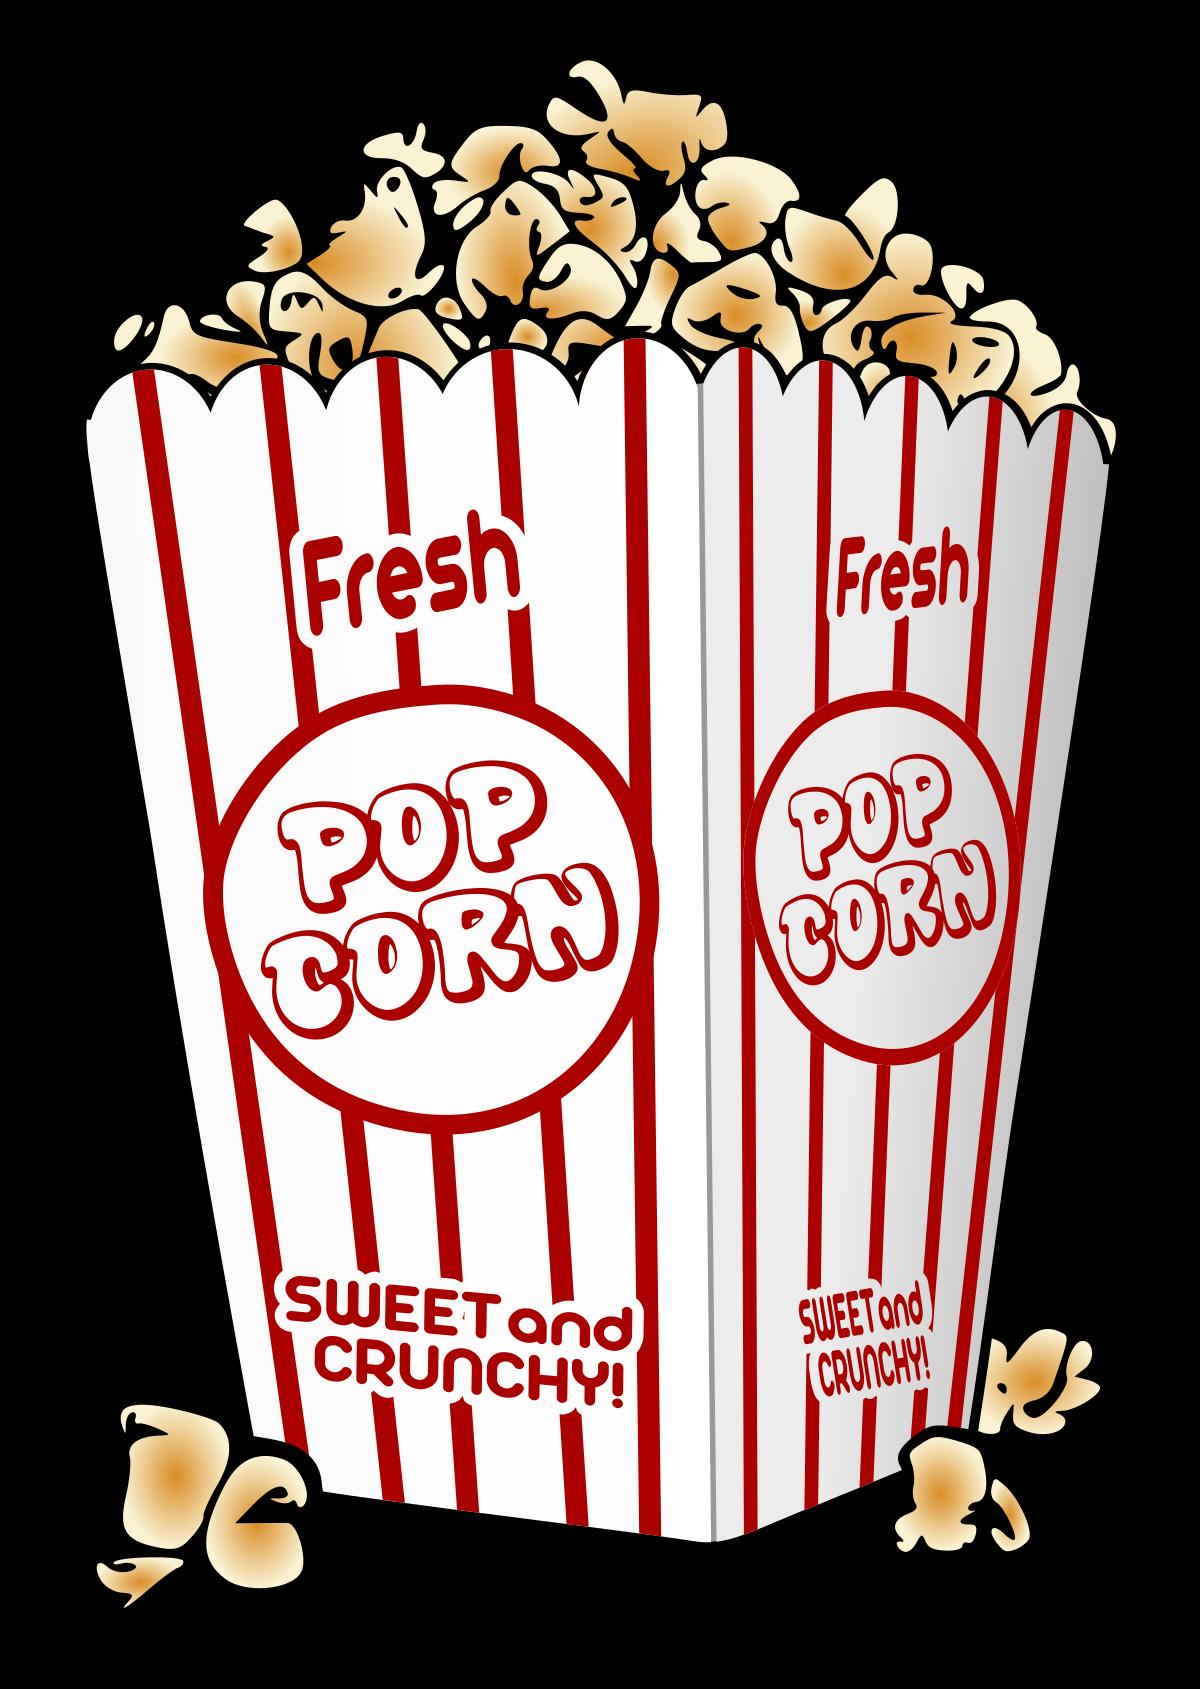 File:Popcorn.svg.